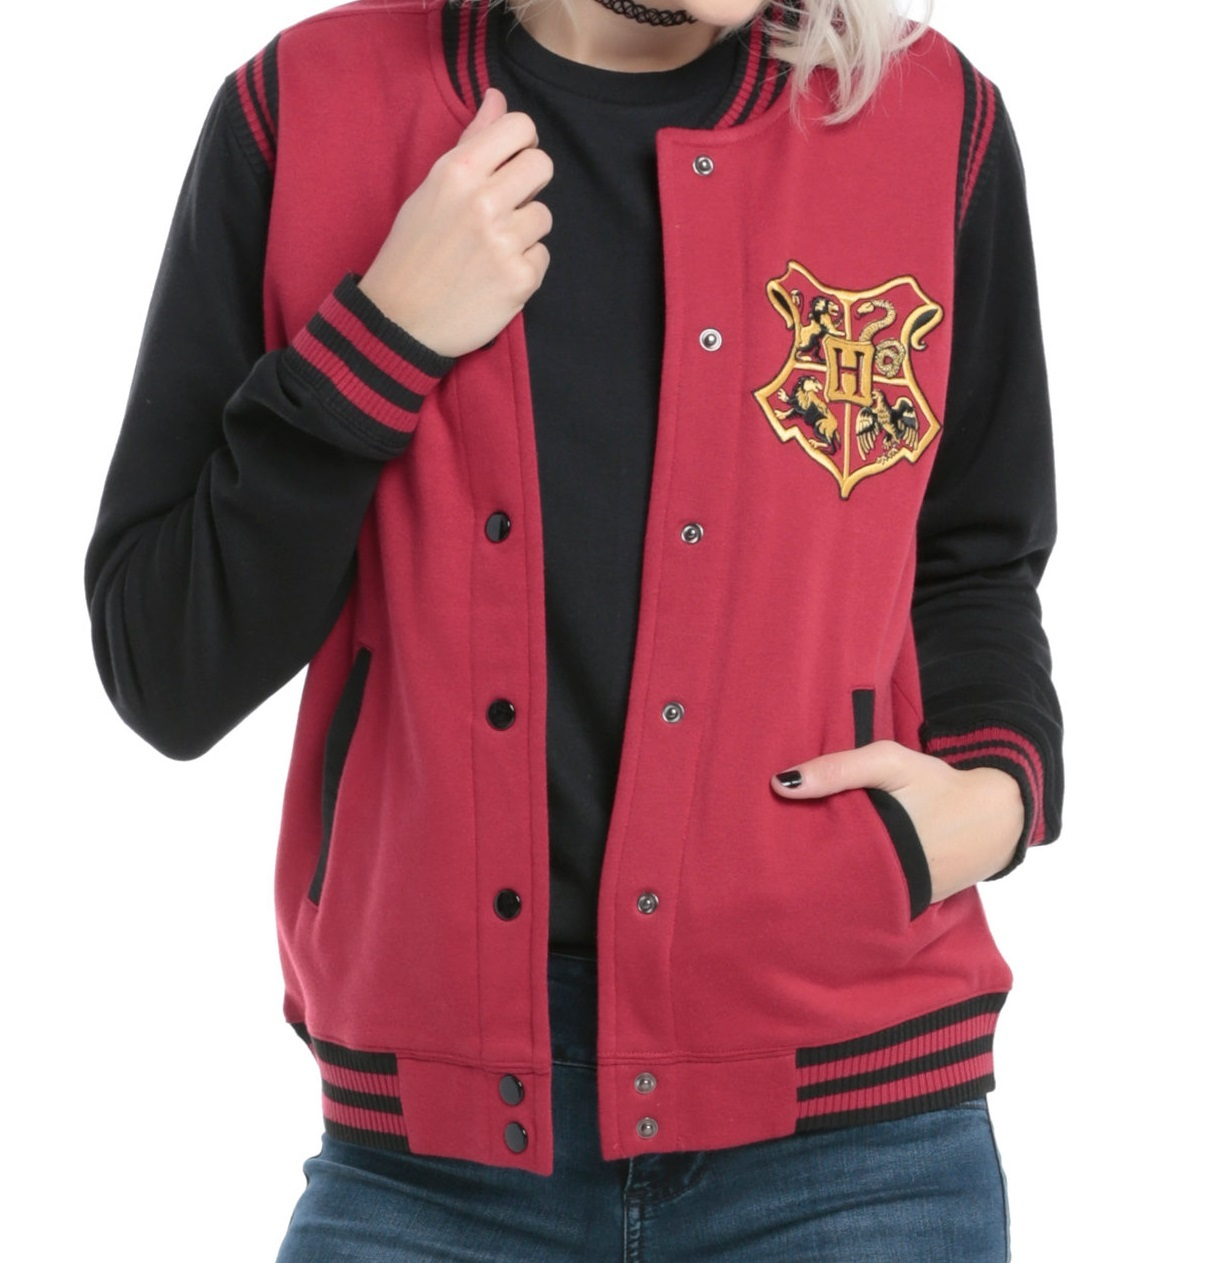 Official Harry Potter Varsity Jacket Hogwarts Colour Crest Black Medium